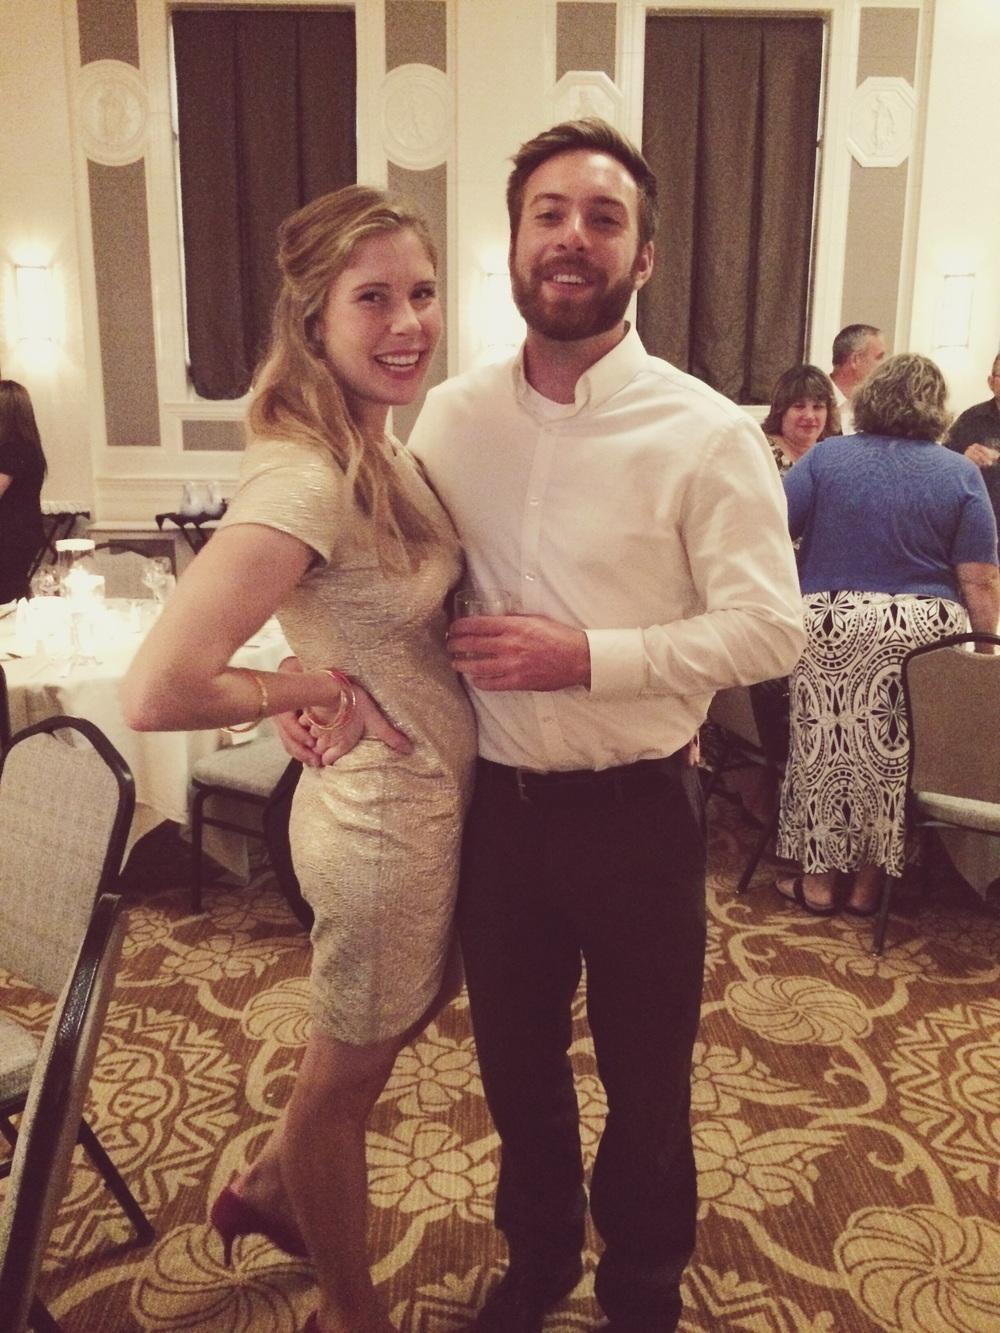 Schmoozin' at Annica and Jordan's wedding